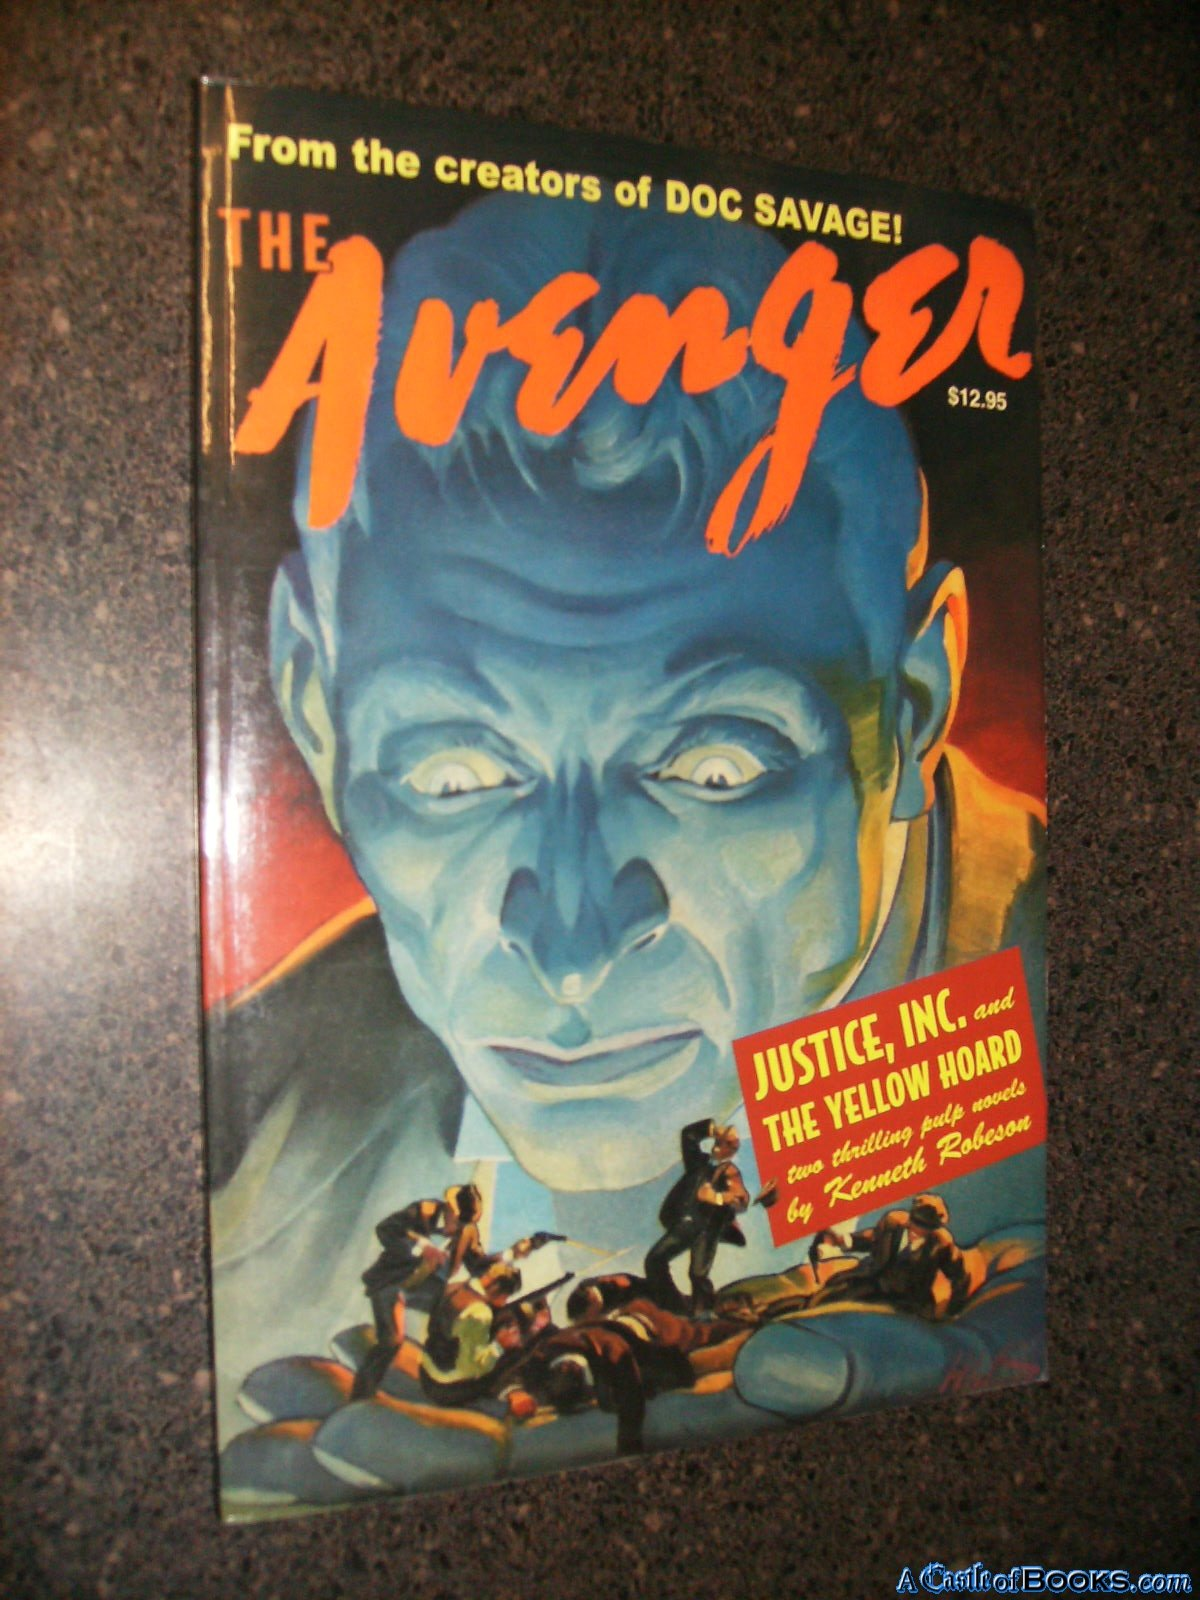 Read Online THE AVENGER #1 (DOUBLE) (1) ebook